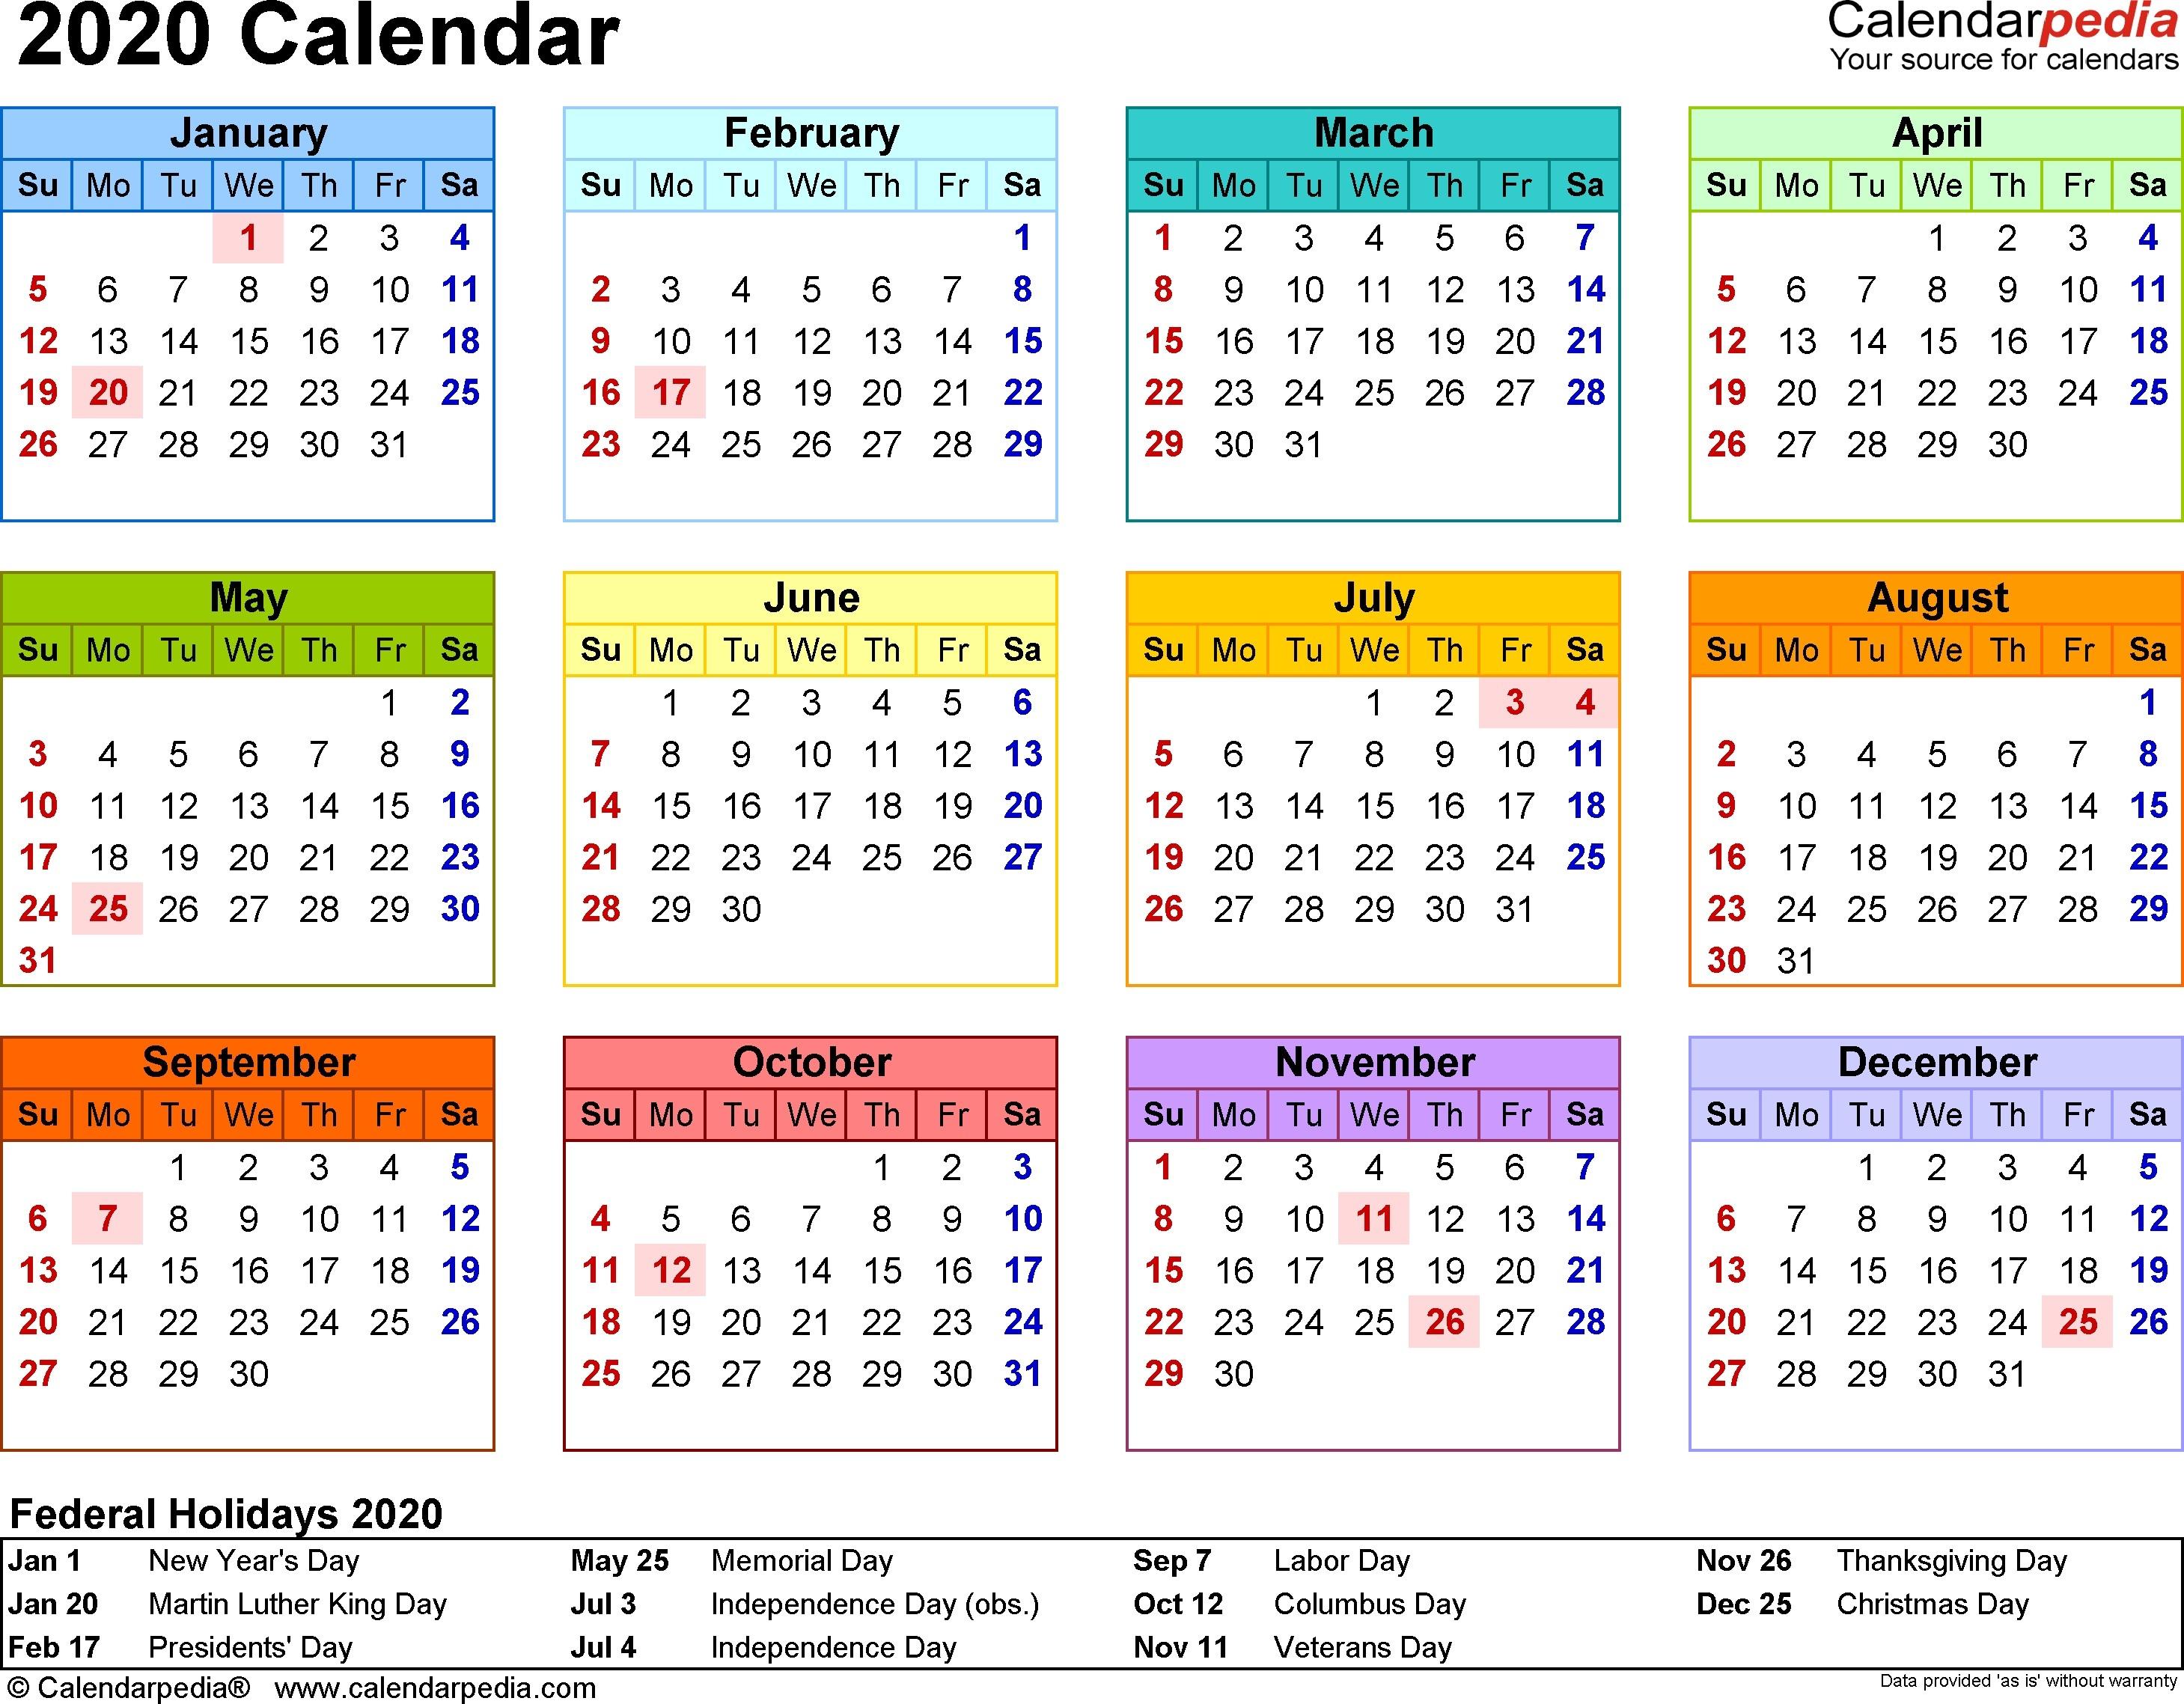 2020 Calendar Excel – Calendar Printable Week-2020 Islamic Calendar Holidays